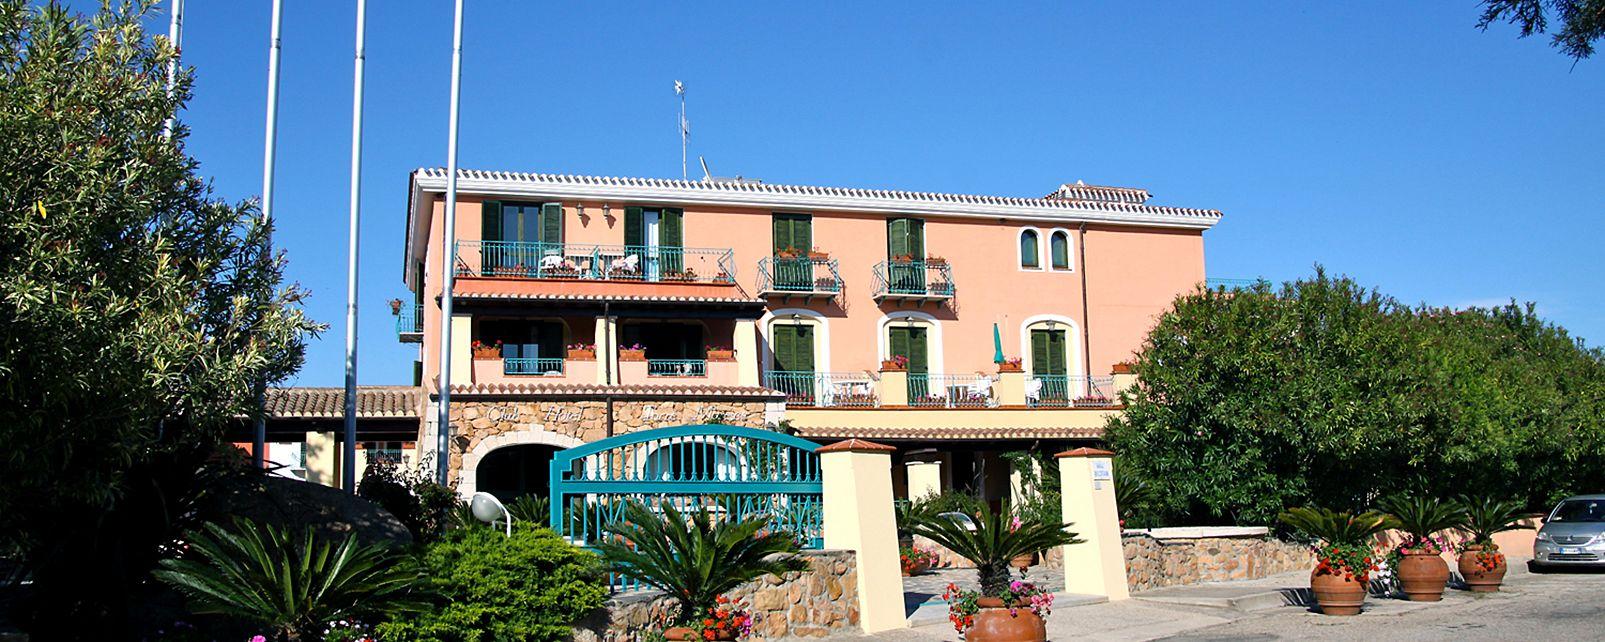 Hotel Club Hotel Torre Moresca